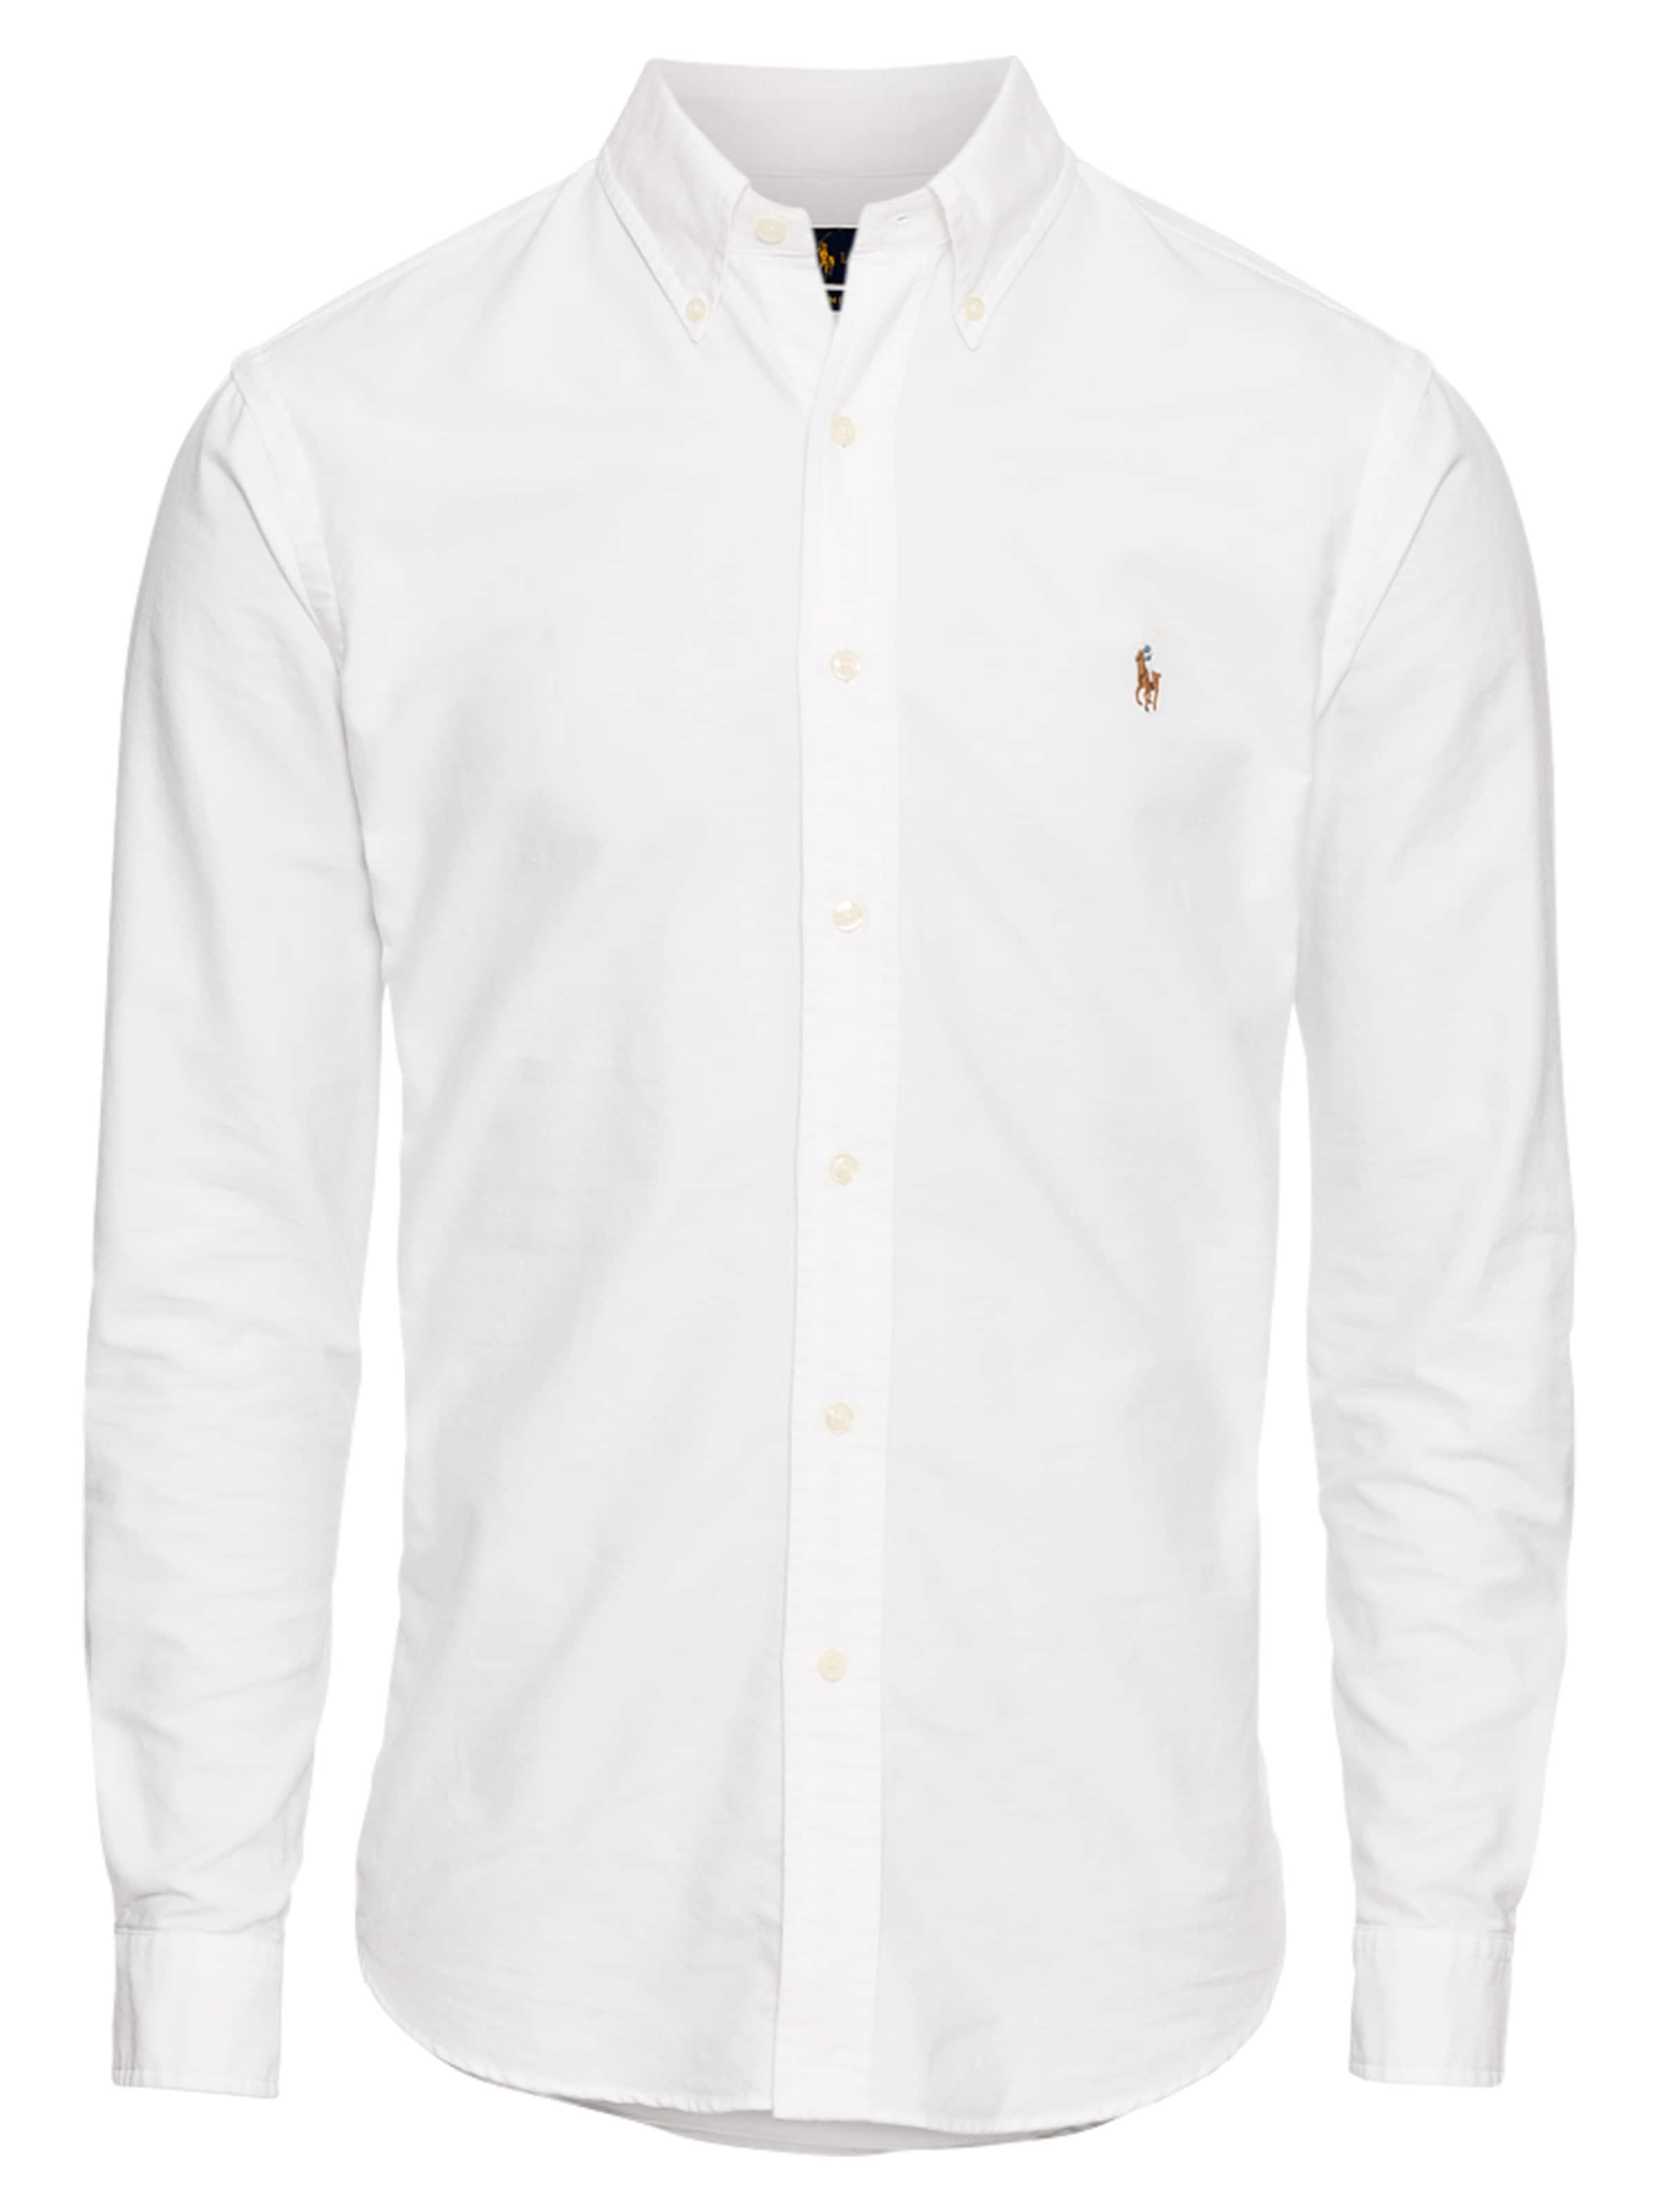 long sport Lauren Polo Shirt' Chemise Bd Ppc Rose 'sl Sp En Ralph Sleeve LUVGMzqSp